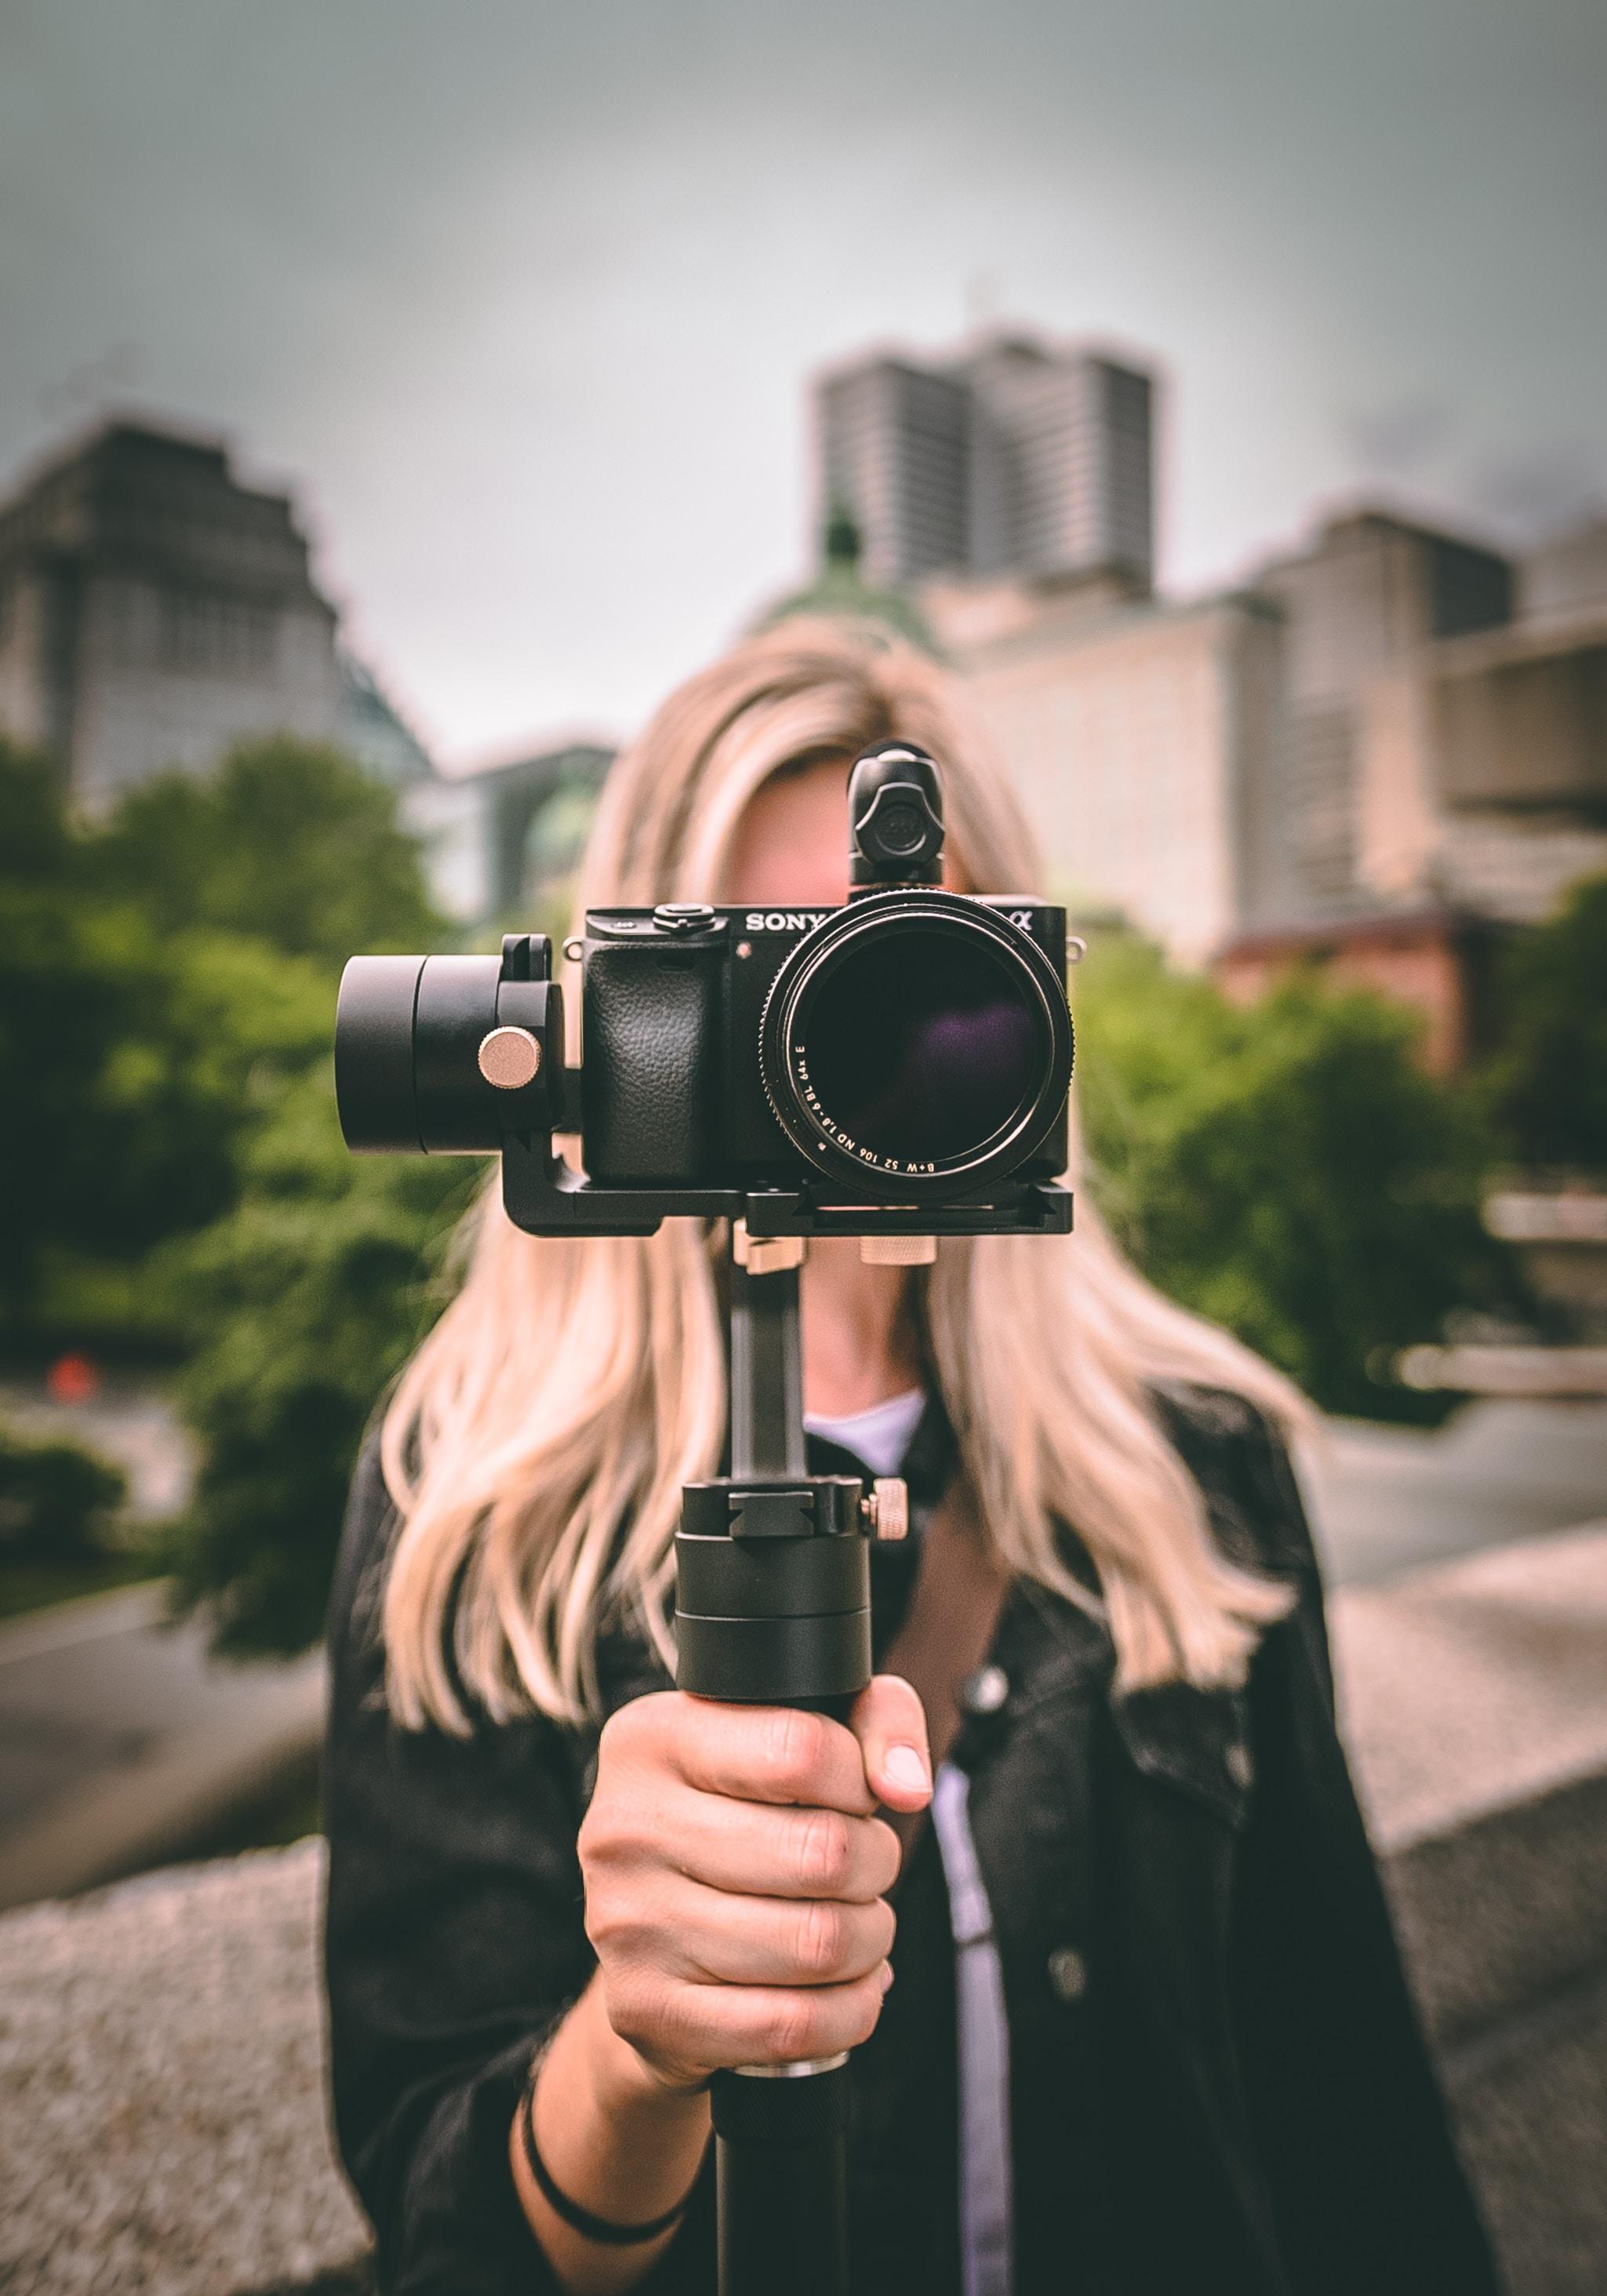 selective focus photography of woman holding camera gimbal